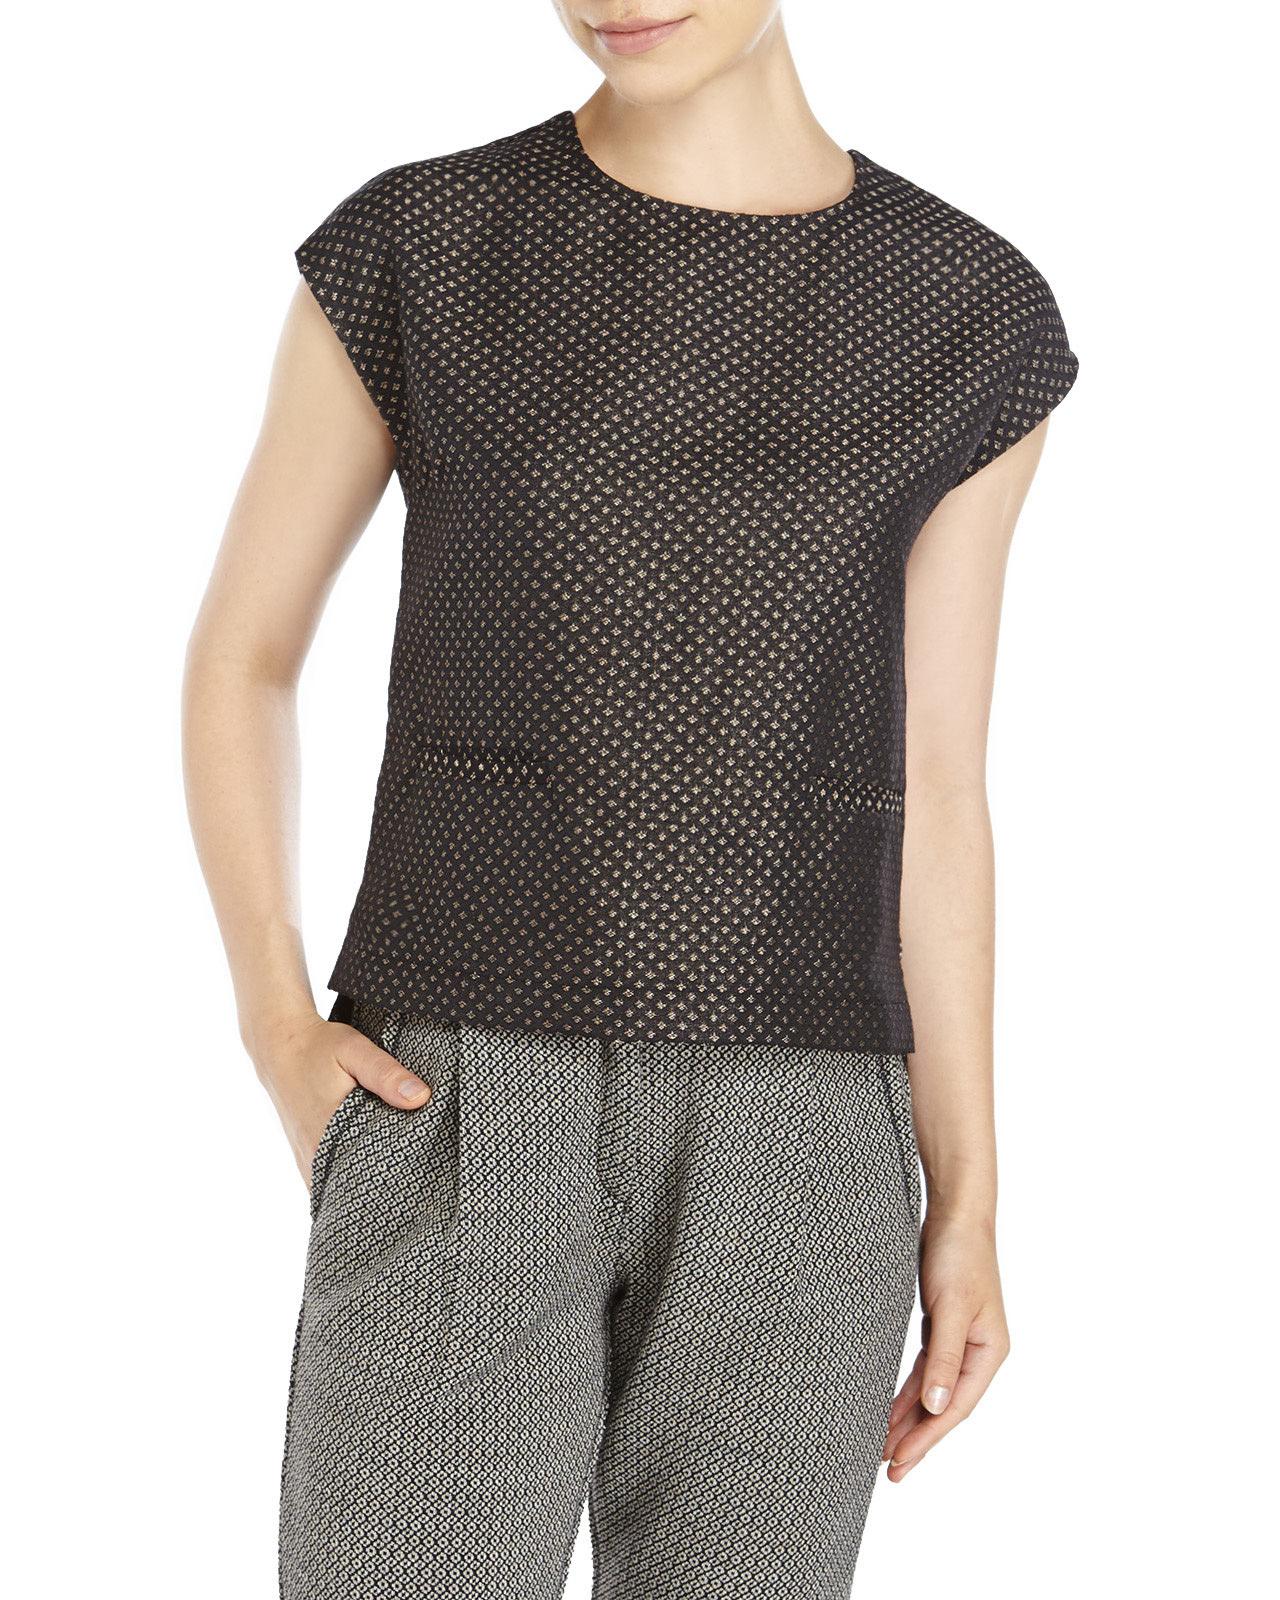 Lyst century 21 ottod 39 ame diamond print blouse in black for Century 21 dress shirts